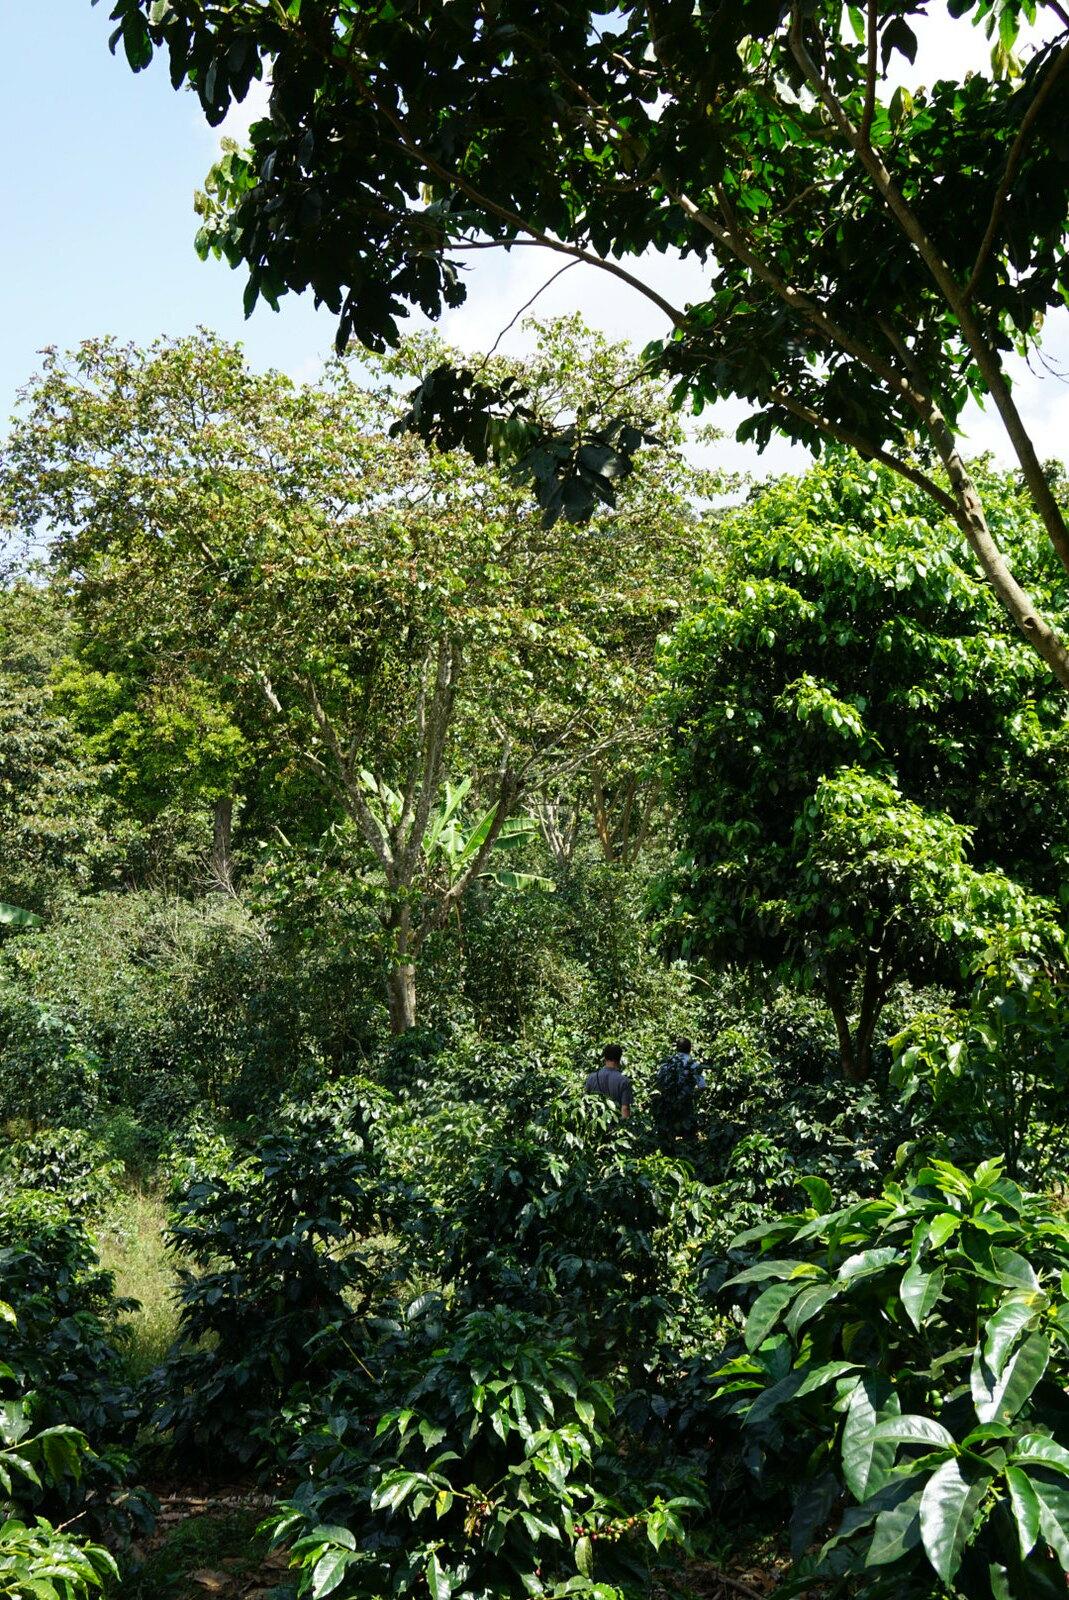 Dense and varied vegetation at Il Professor